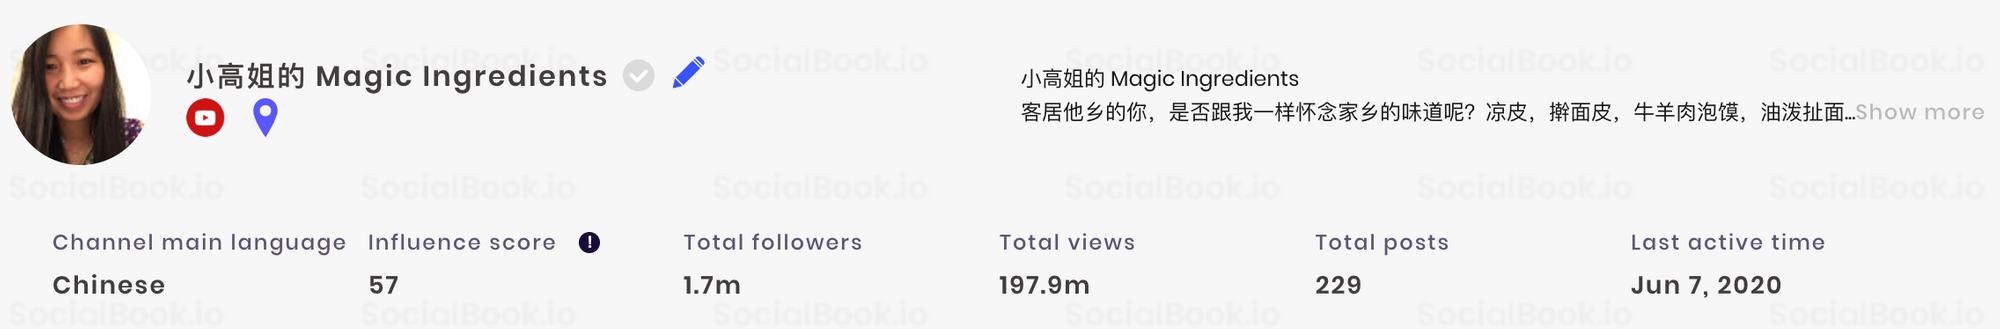 小高姐的Magic Ingredients YouTube频道粉丝数量(出自SocialBook)